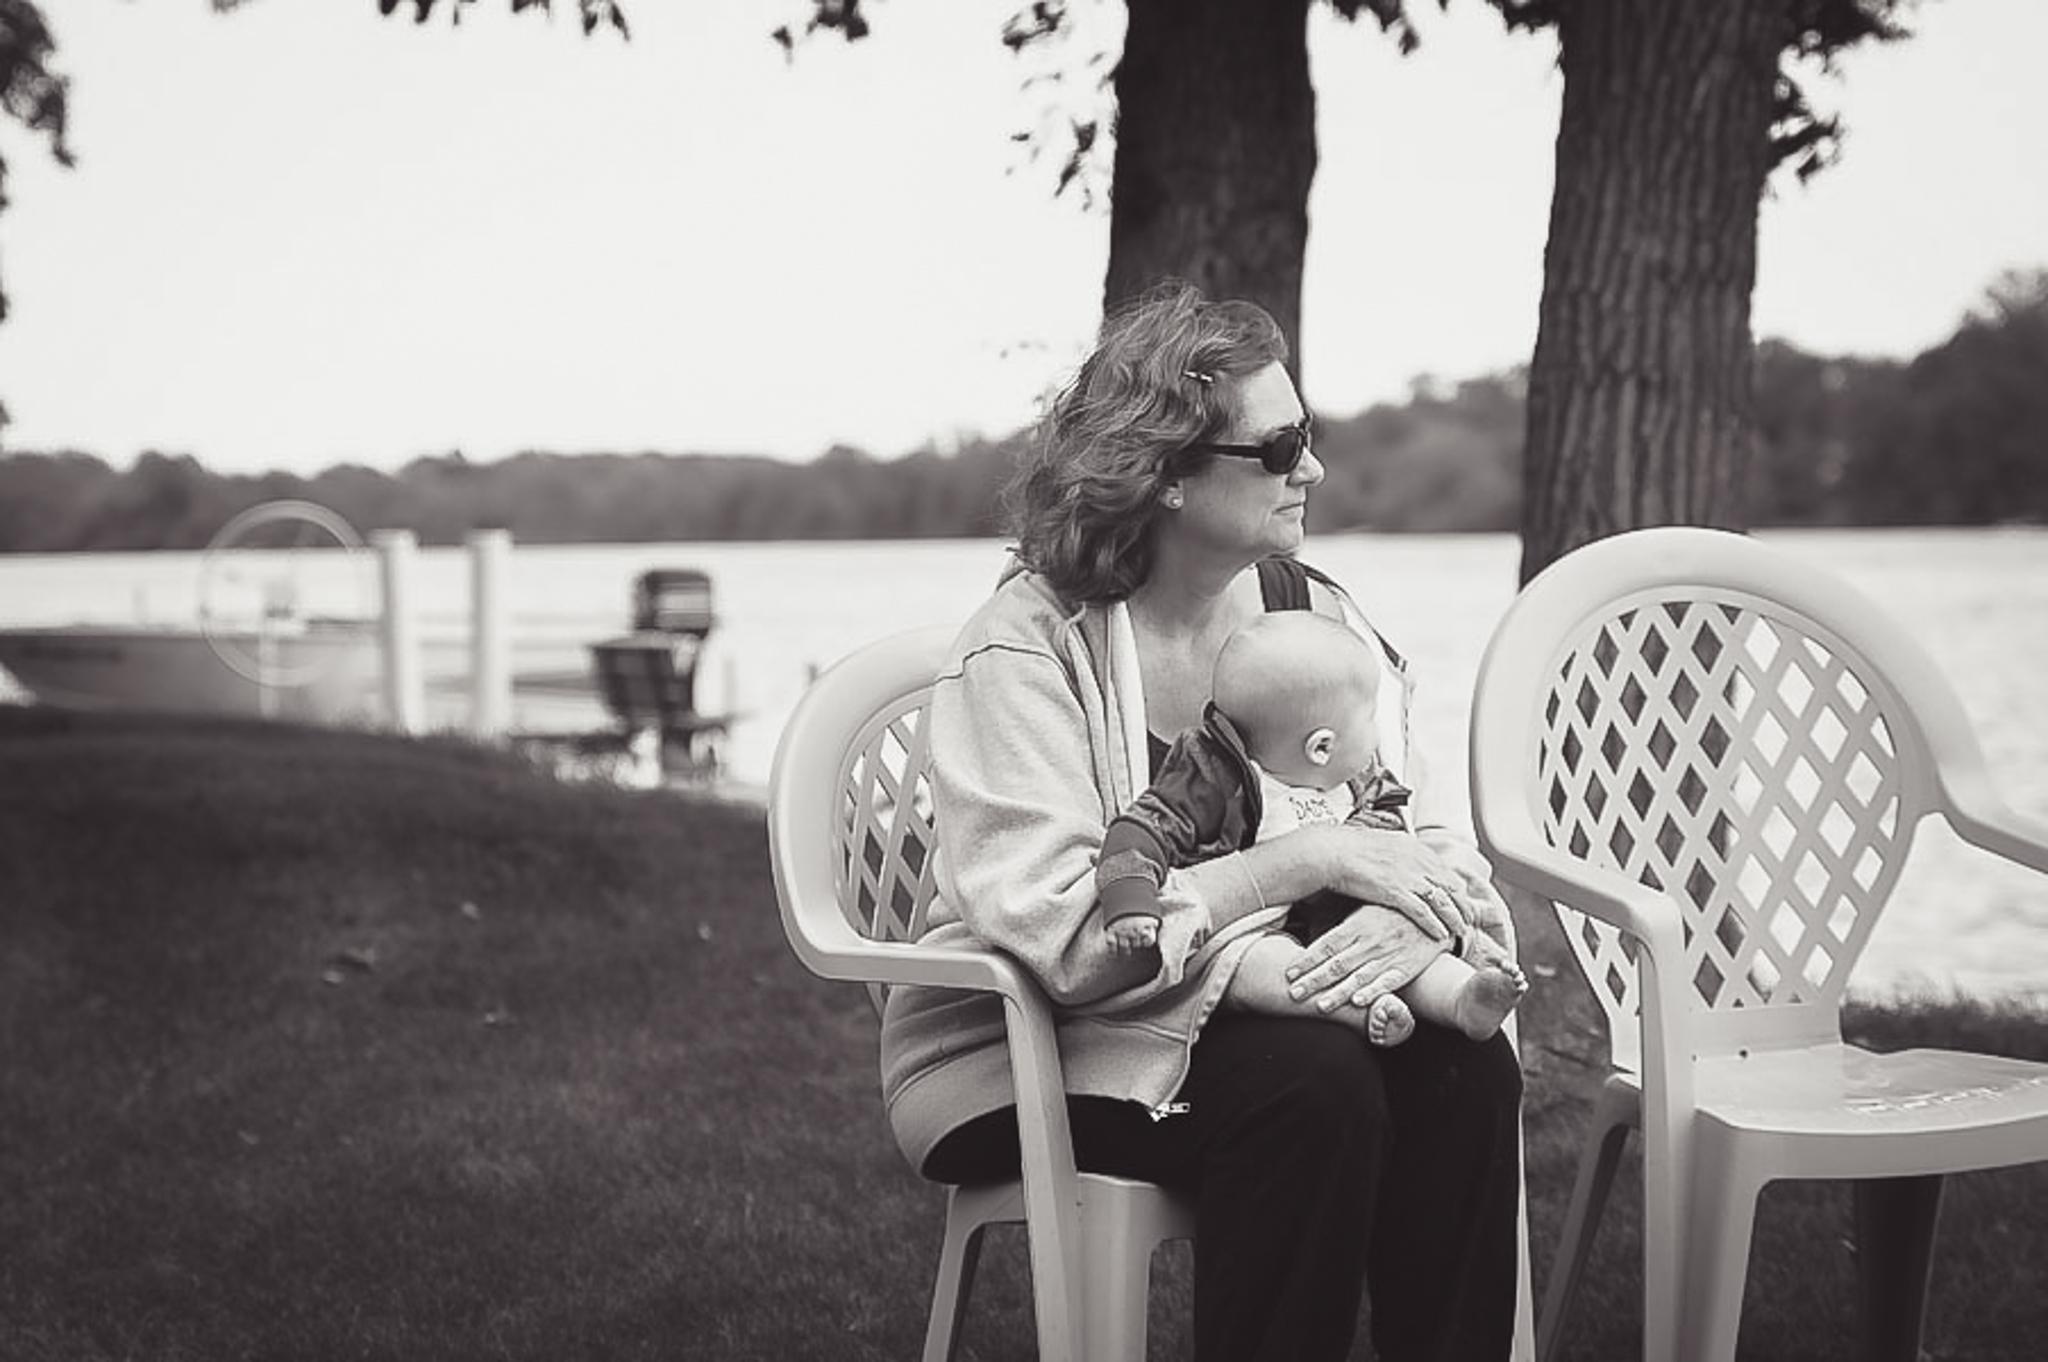 Grandma Kay & James at the Cabin (August 29, 2015)